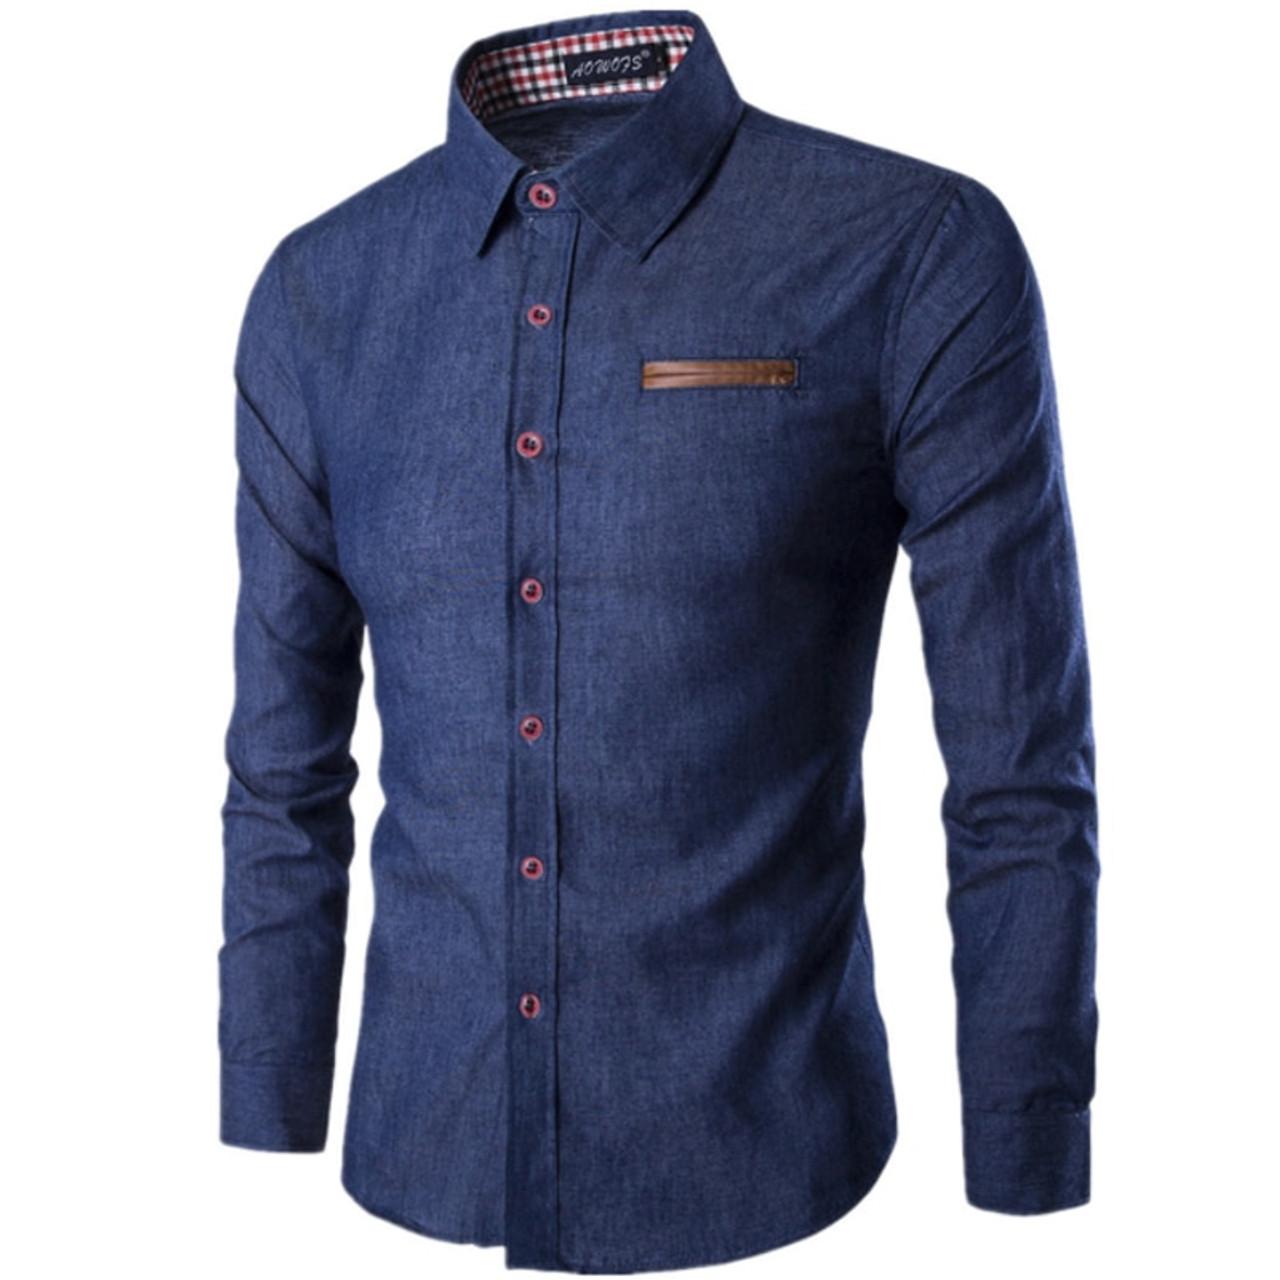 a7492328d31e 2018 New Fashion Brand Men Shirt Pocket Fight Leather Dress Shirt Long  Sleeve Slim Fit Camisa ...